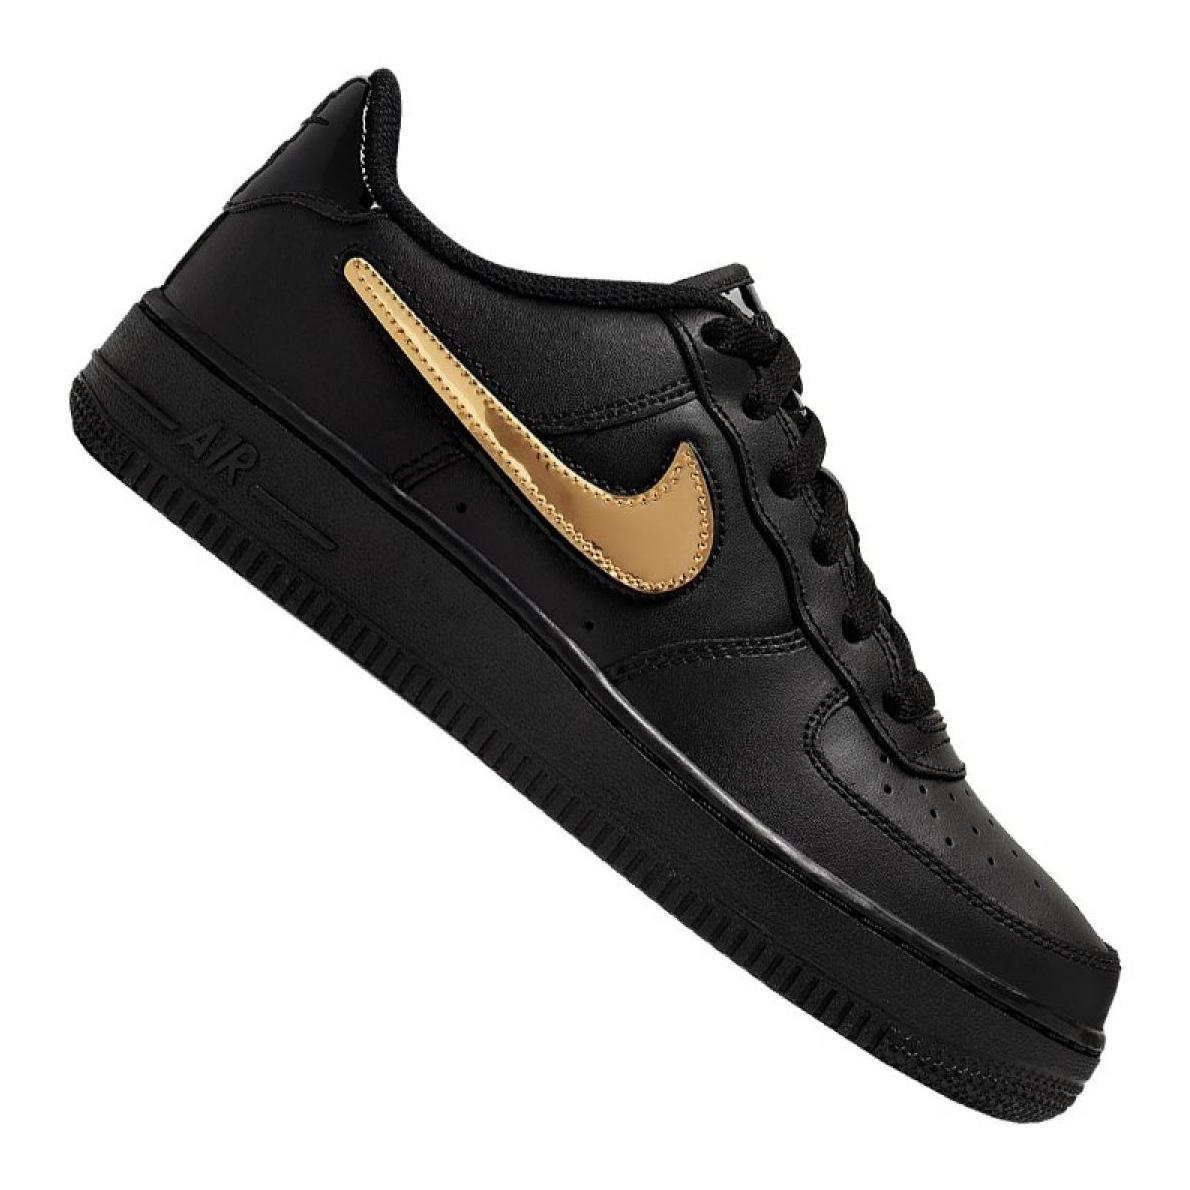 Black Nike Air Force 1 LV8 3 Jr AR7446 001 shoes